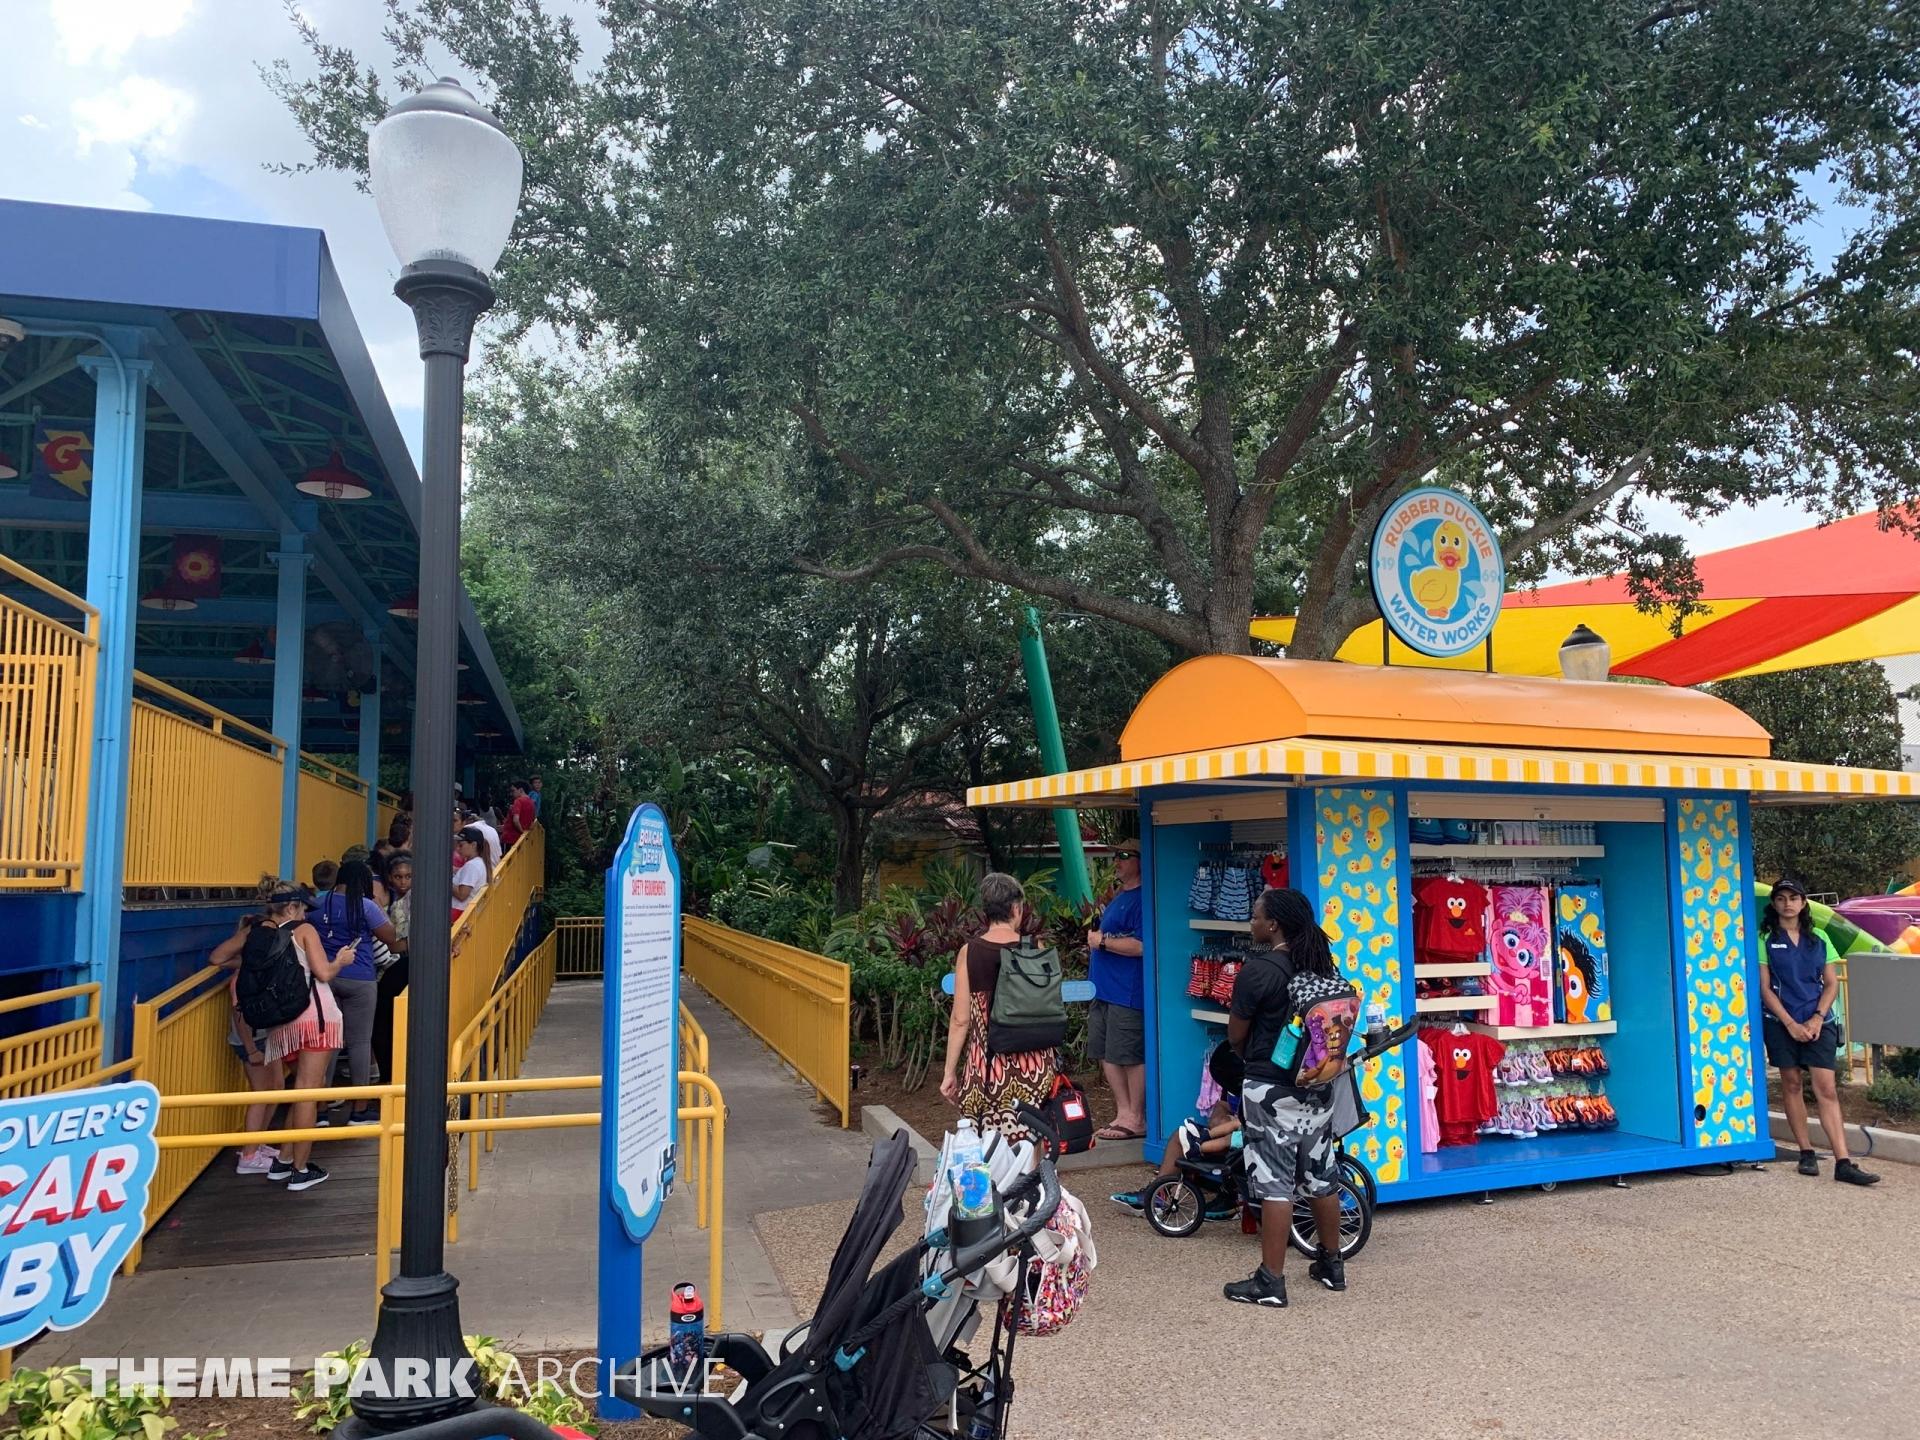 Super Grover's Box Car Derby at Sea World Orlando